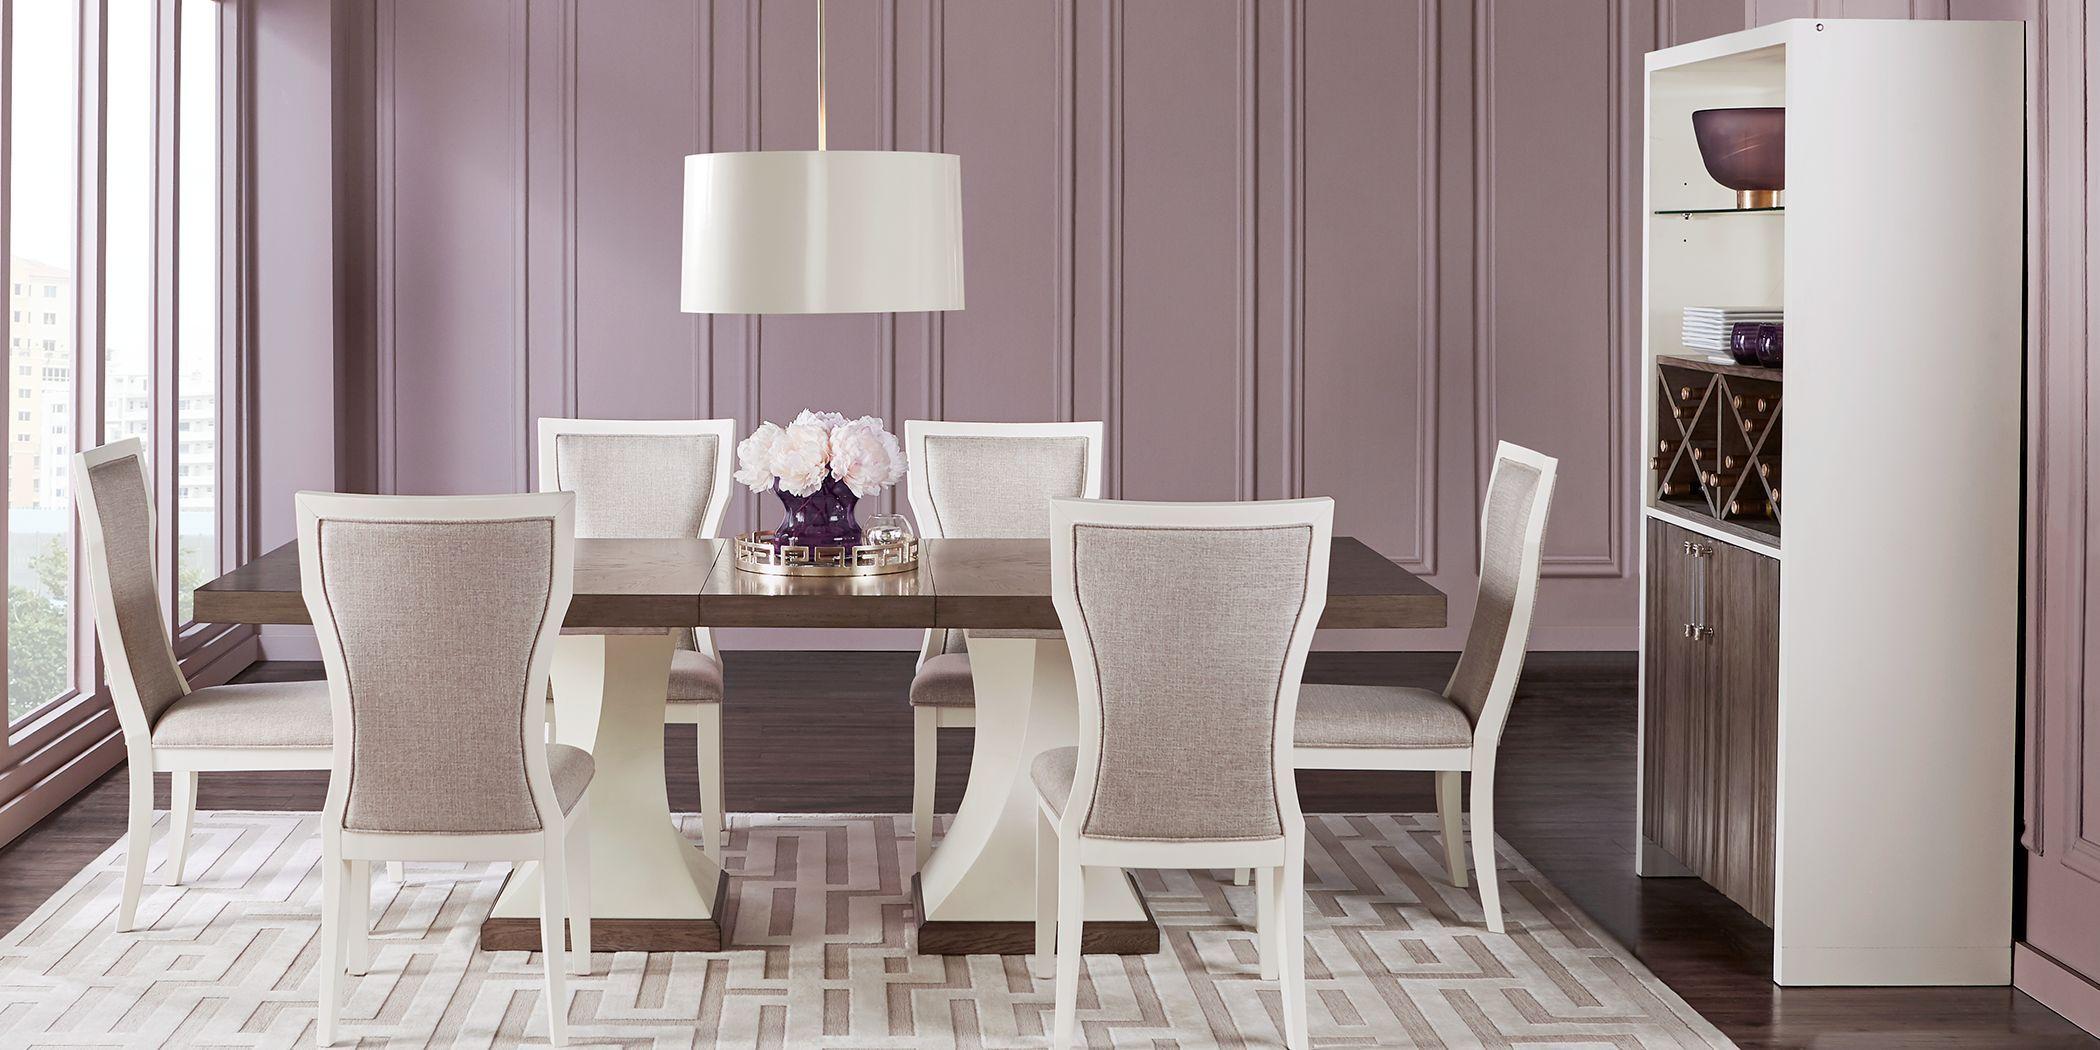 Sofia Vergara Santa Fiora White 5 Pc Dining Room Set